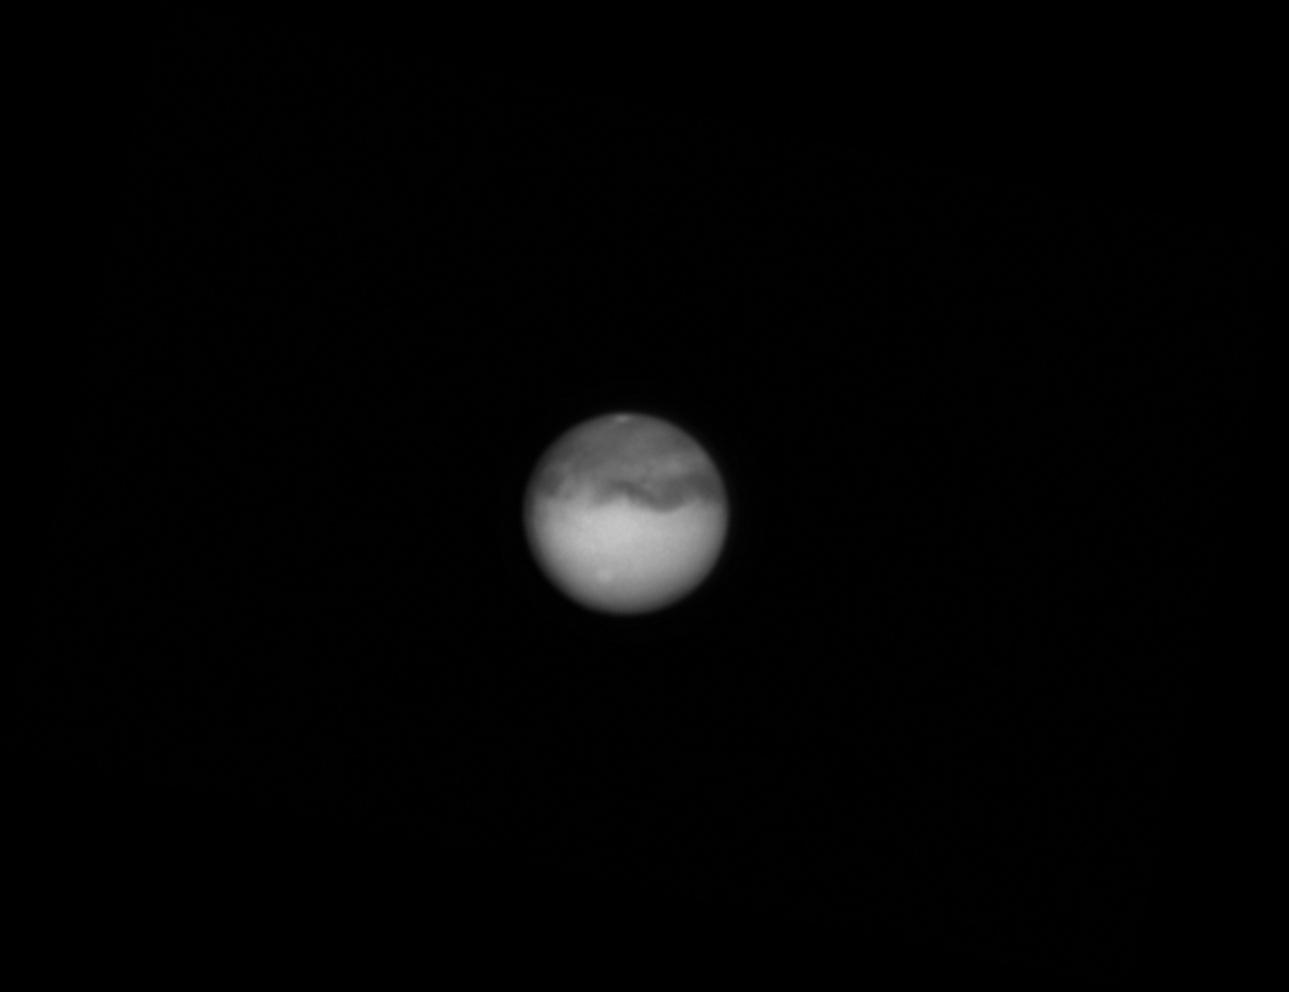 Mars_230107_zoomR.jpg.77acdca100739a756f192e85c749bcd0.jpg